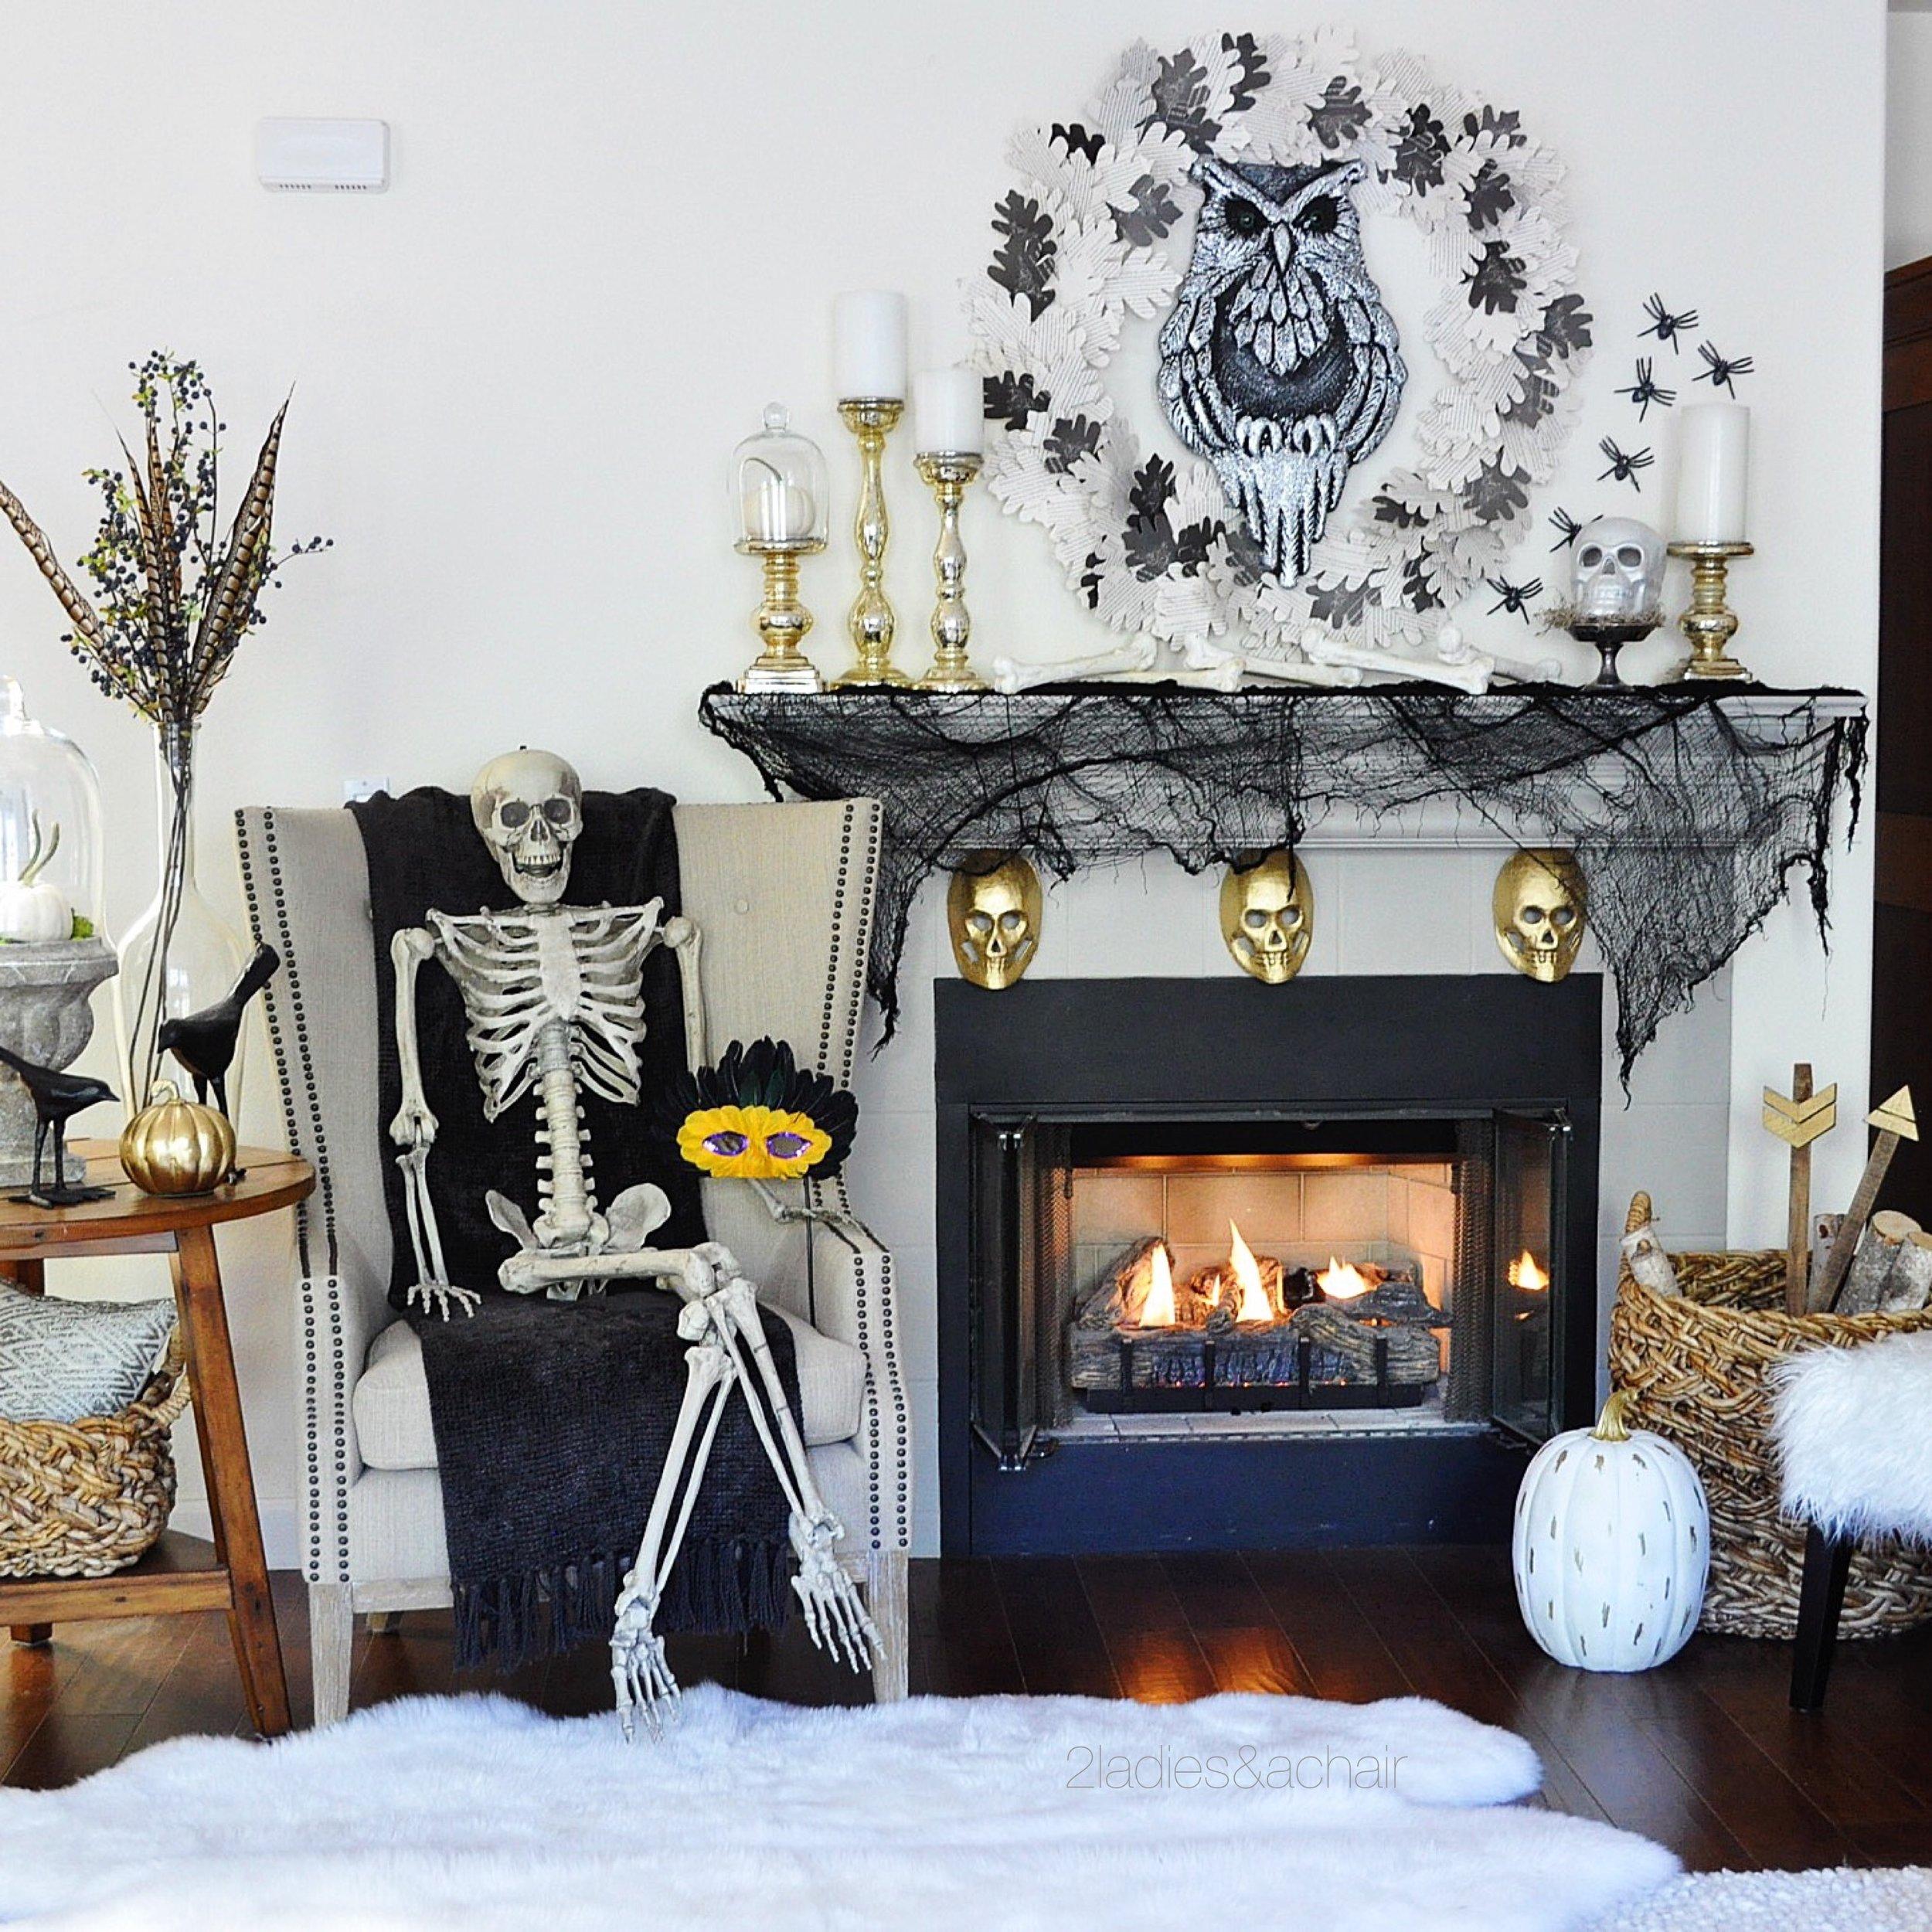 halloween mantel decorations IMG_5622.JPG